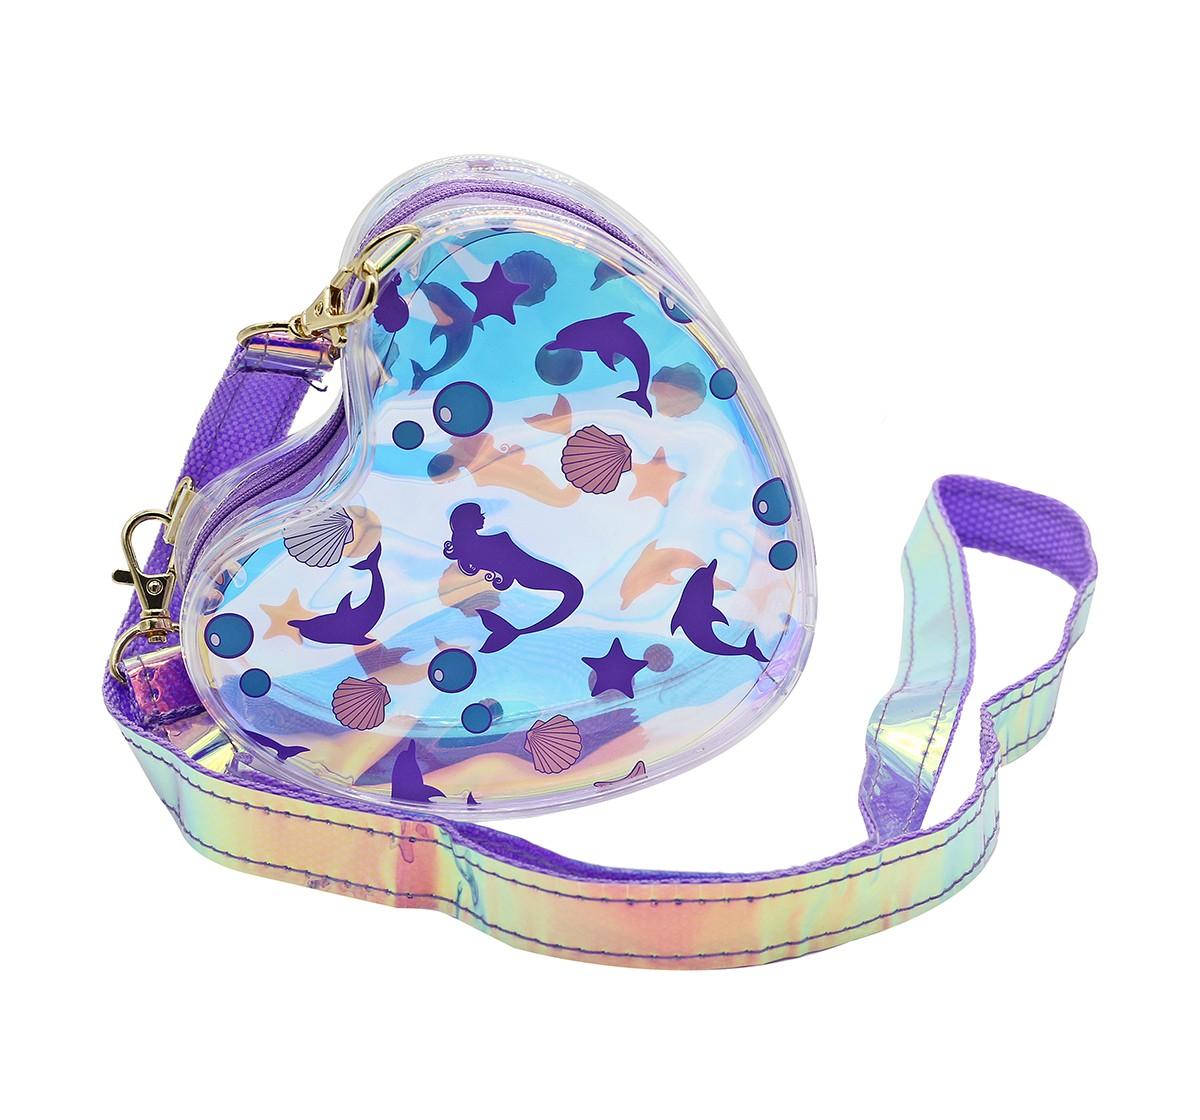 Hamster London Heart Shaped Mermaid Sling Bag for Girls age 3Y+ (Purple)